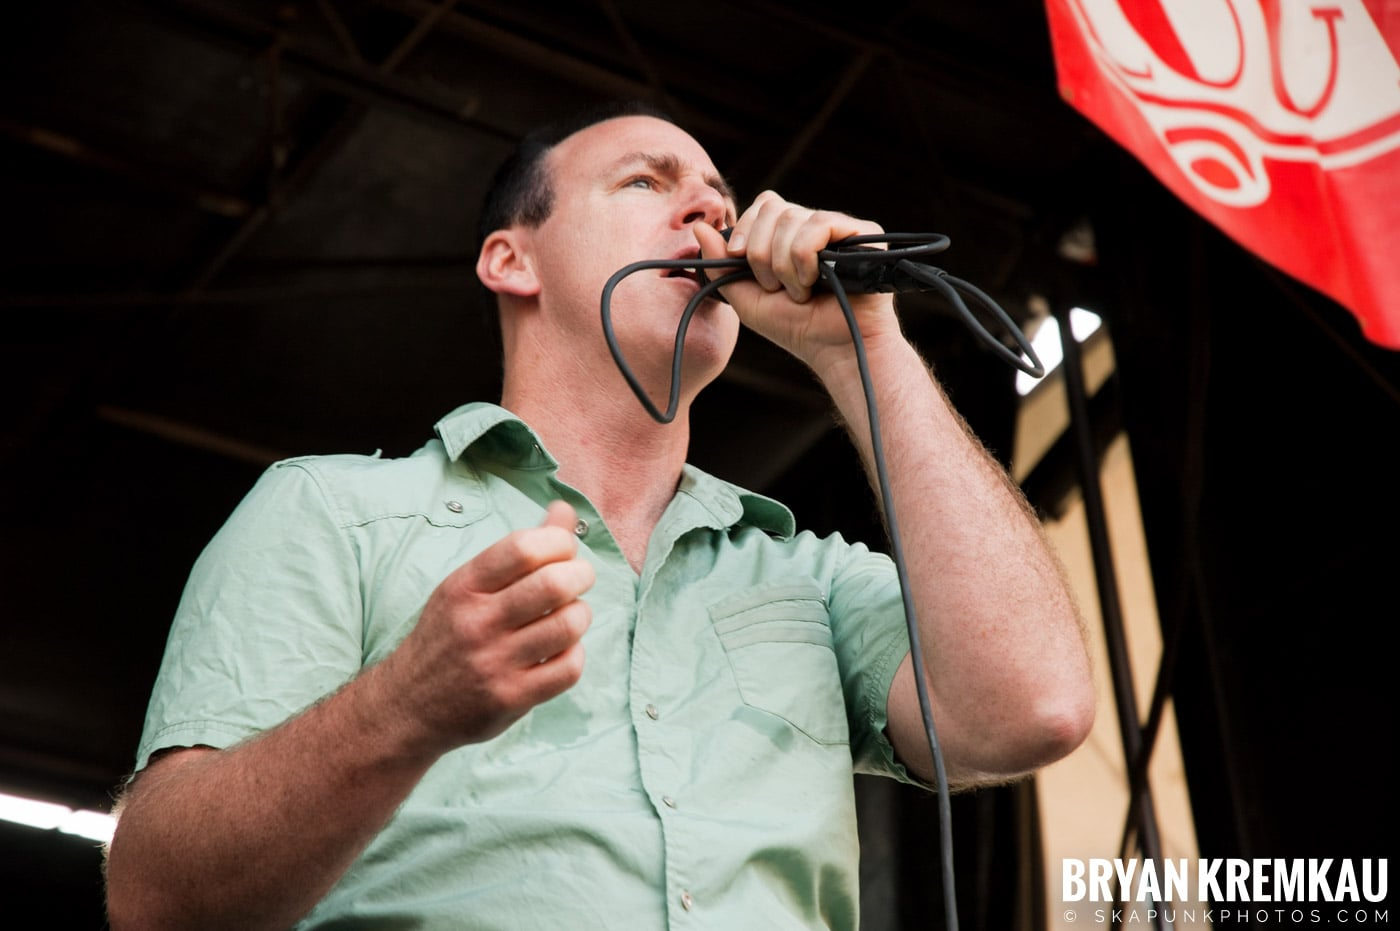 Bad Religion @ Warped Tour 2007, Scranton PA - 7.26.07 (11)